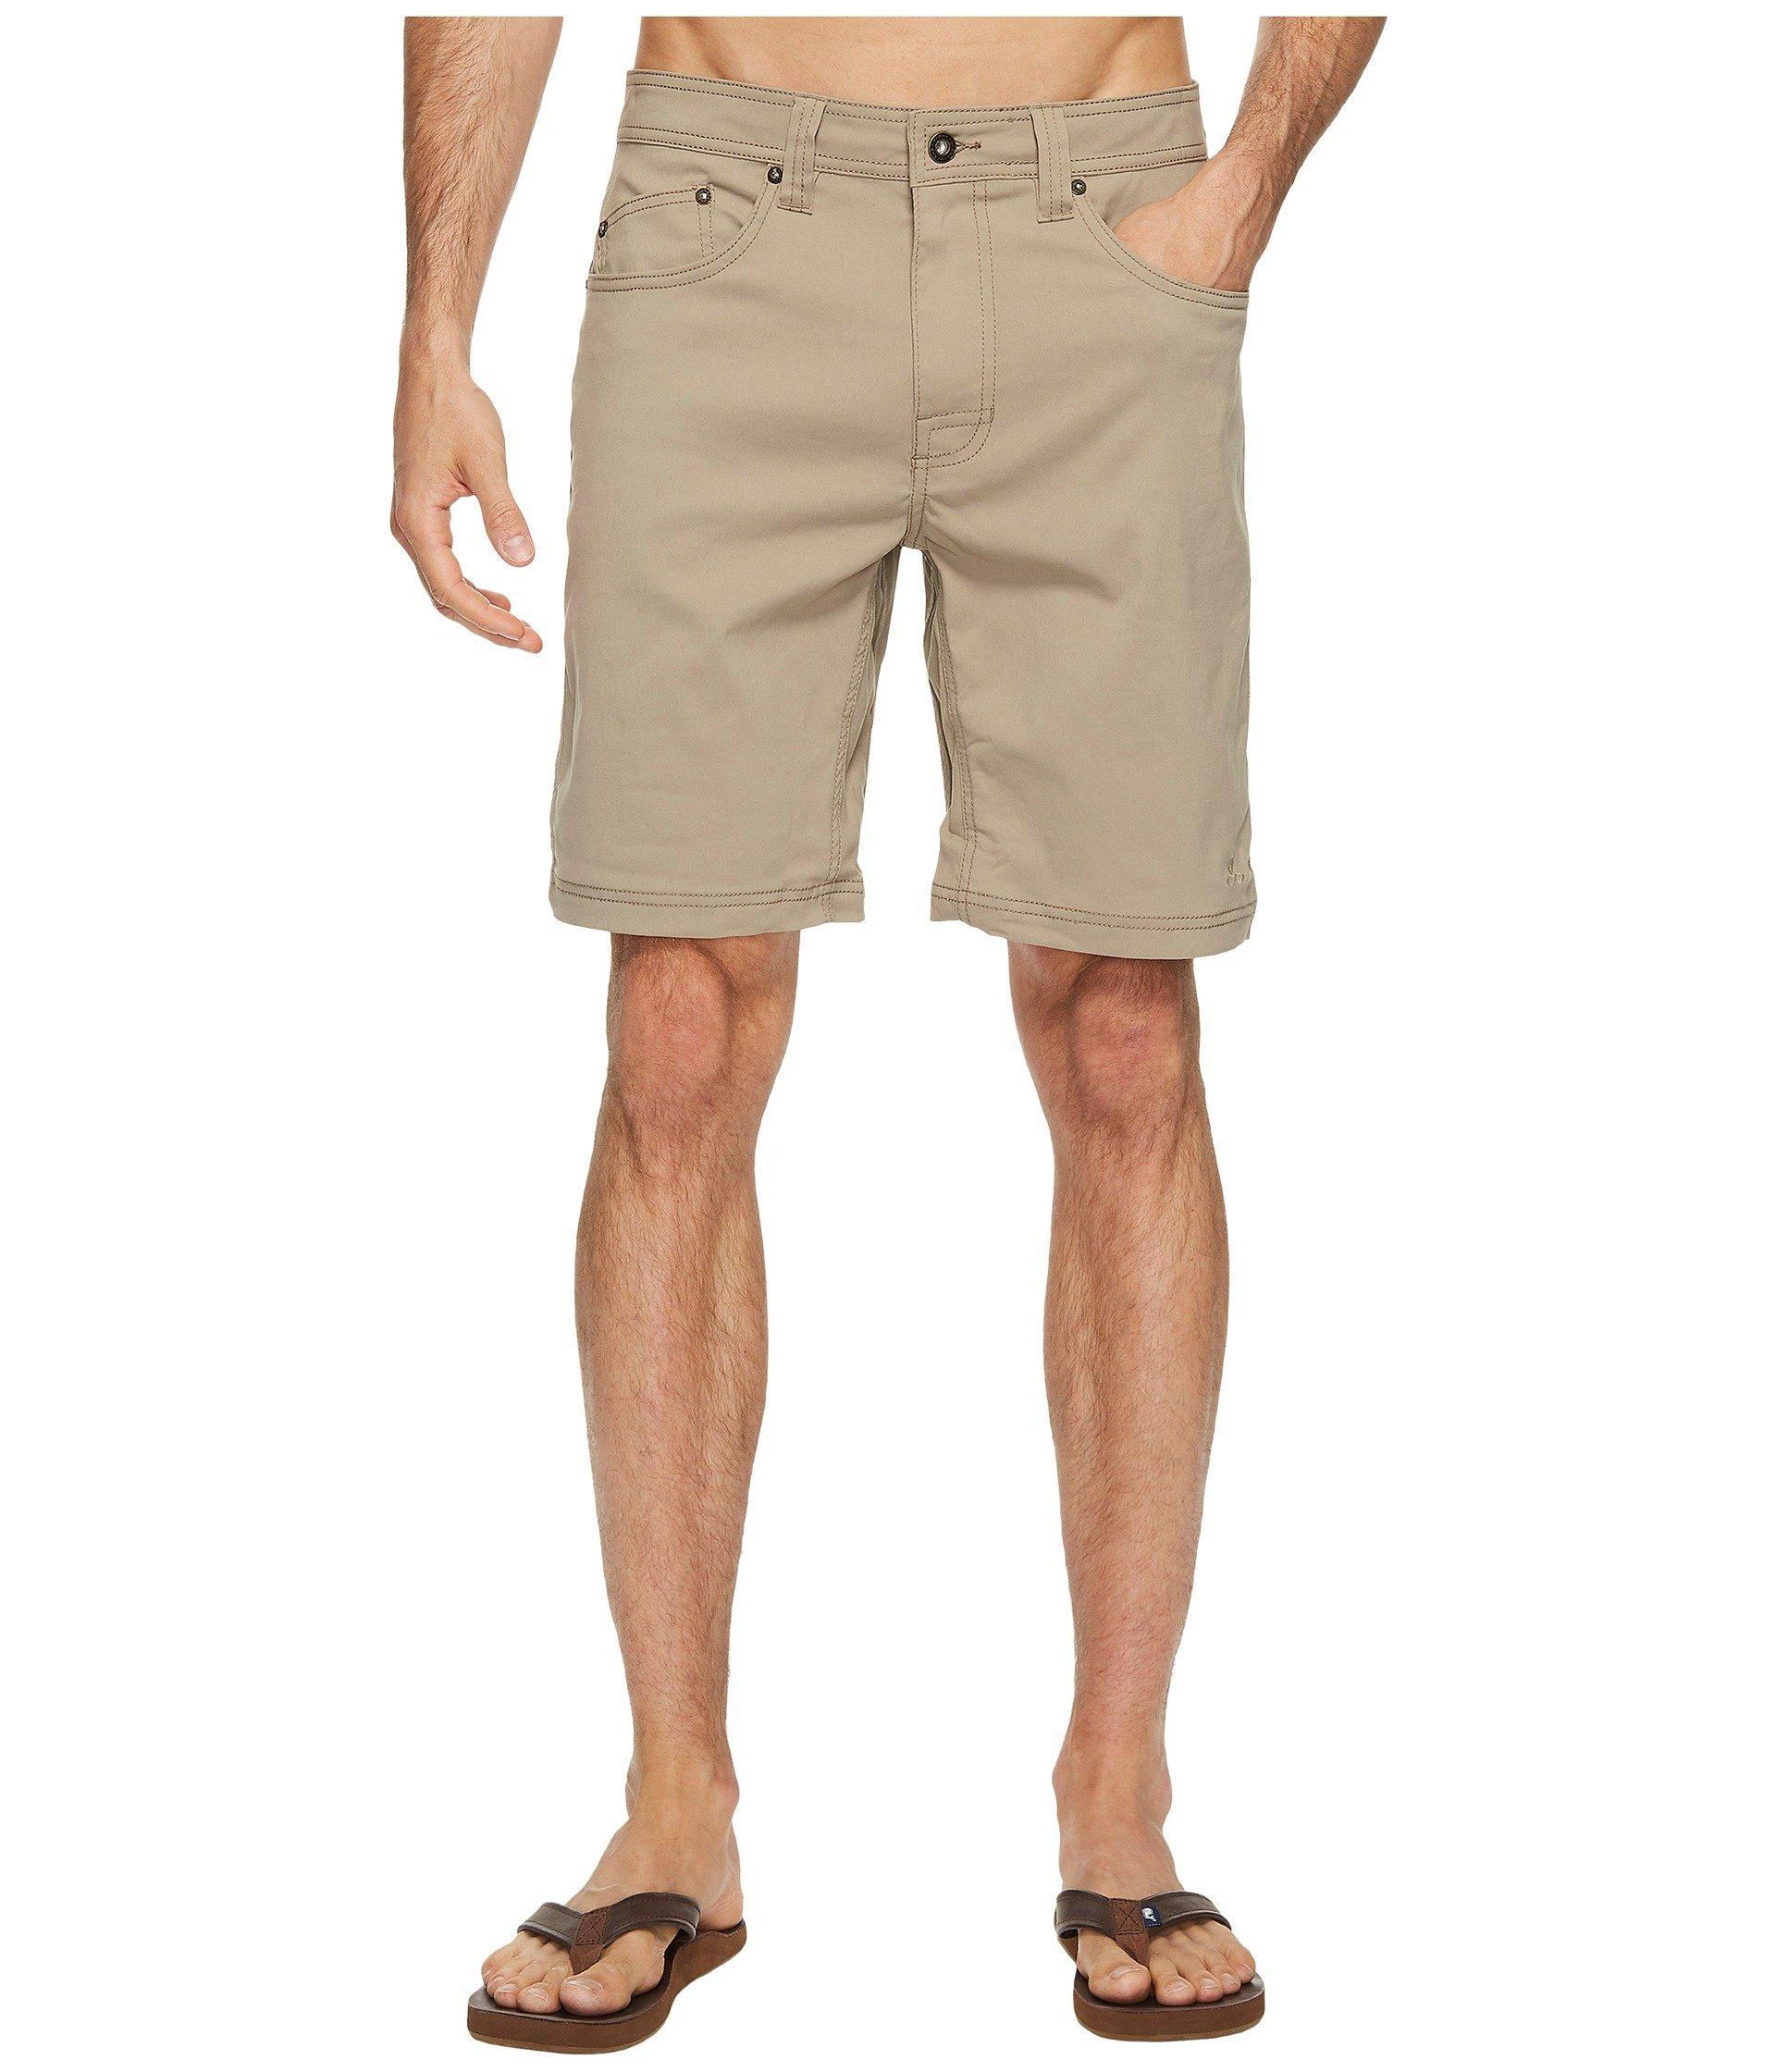 f5cc68cc70 Prana Brion 9 Short (aloe) Men's Shorts in Natural for Men - Lyst